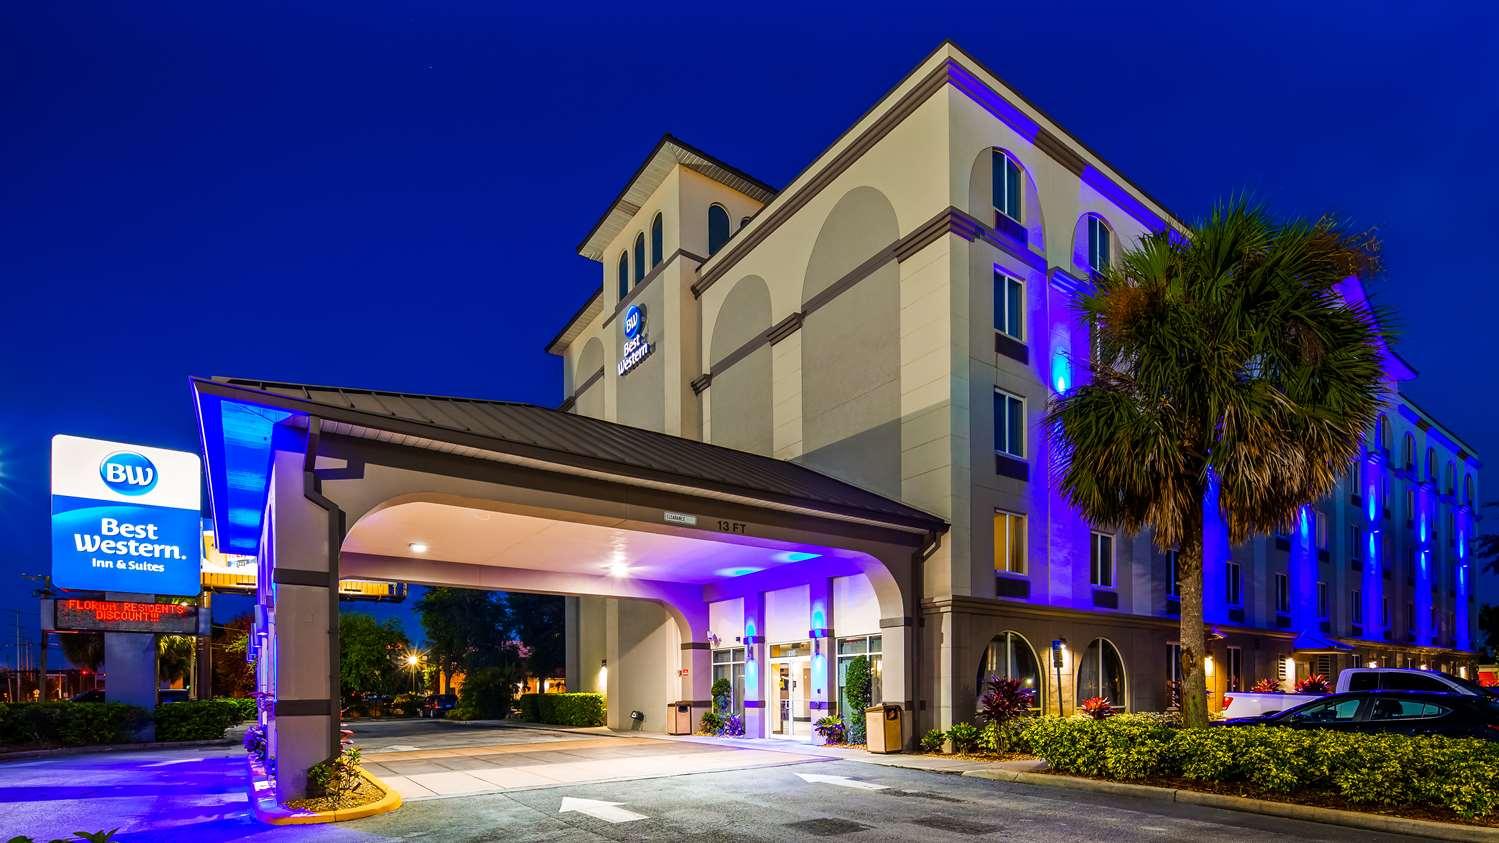 Exterior view - Best Western Orlando Airport Inn & Suites